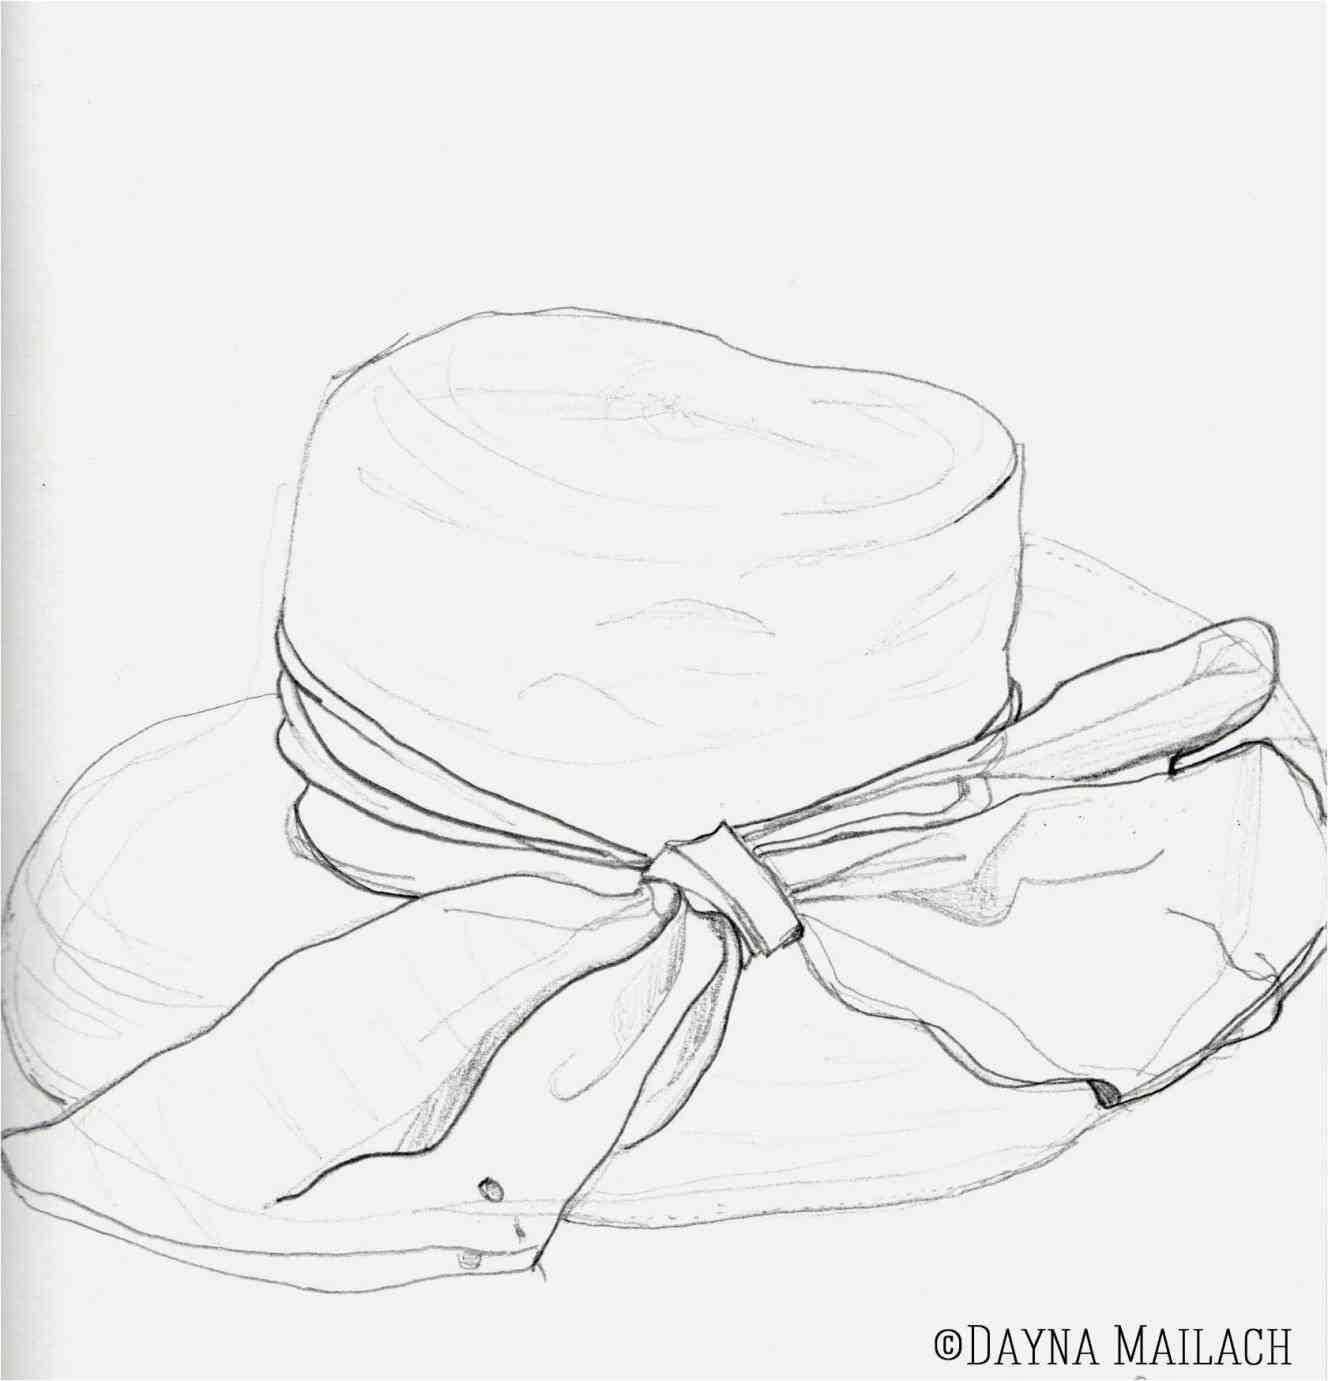 1328x1381 Xcbxecoolxcbxe Pen Xcbxe Cool Drawings Com Tumblr Xcbxecoolxcbxe